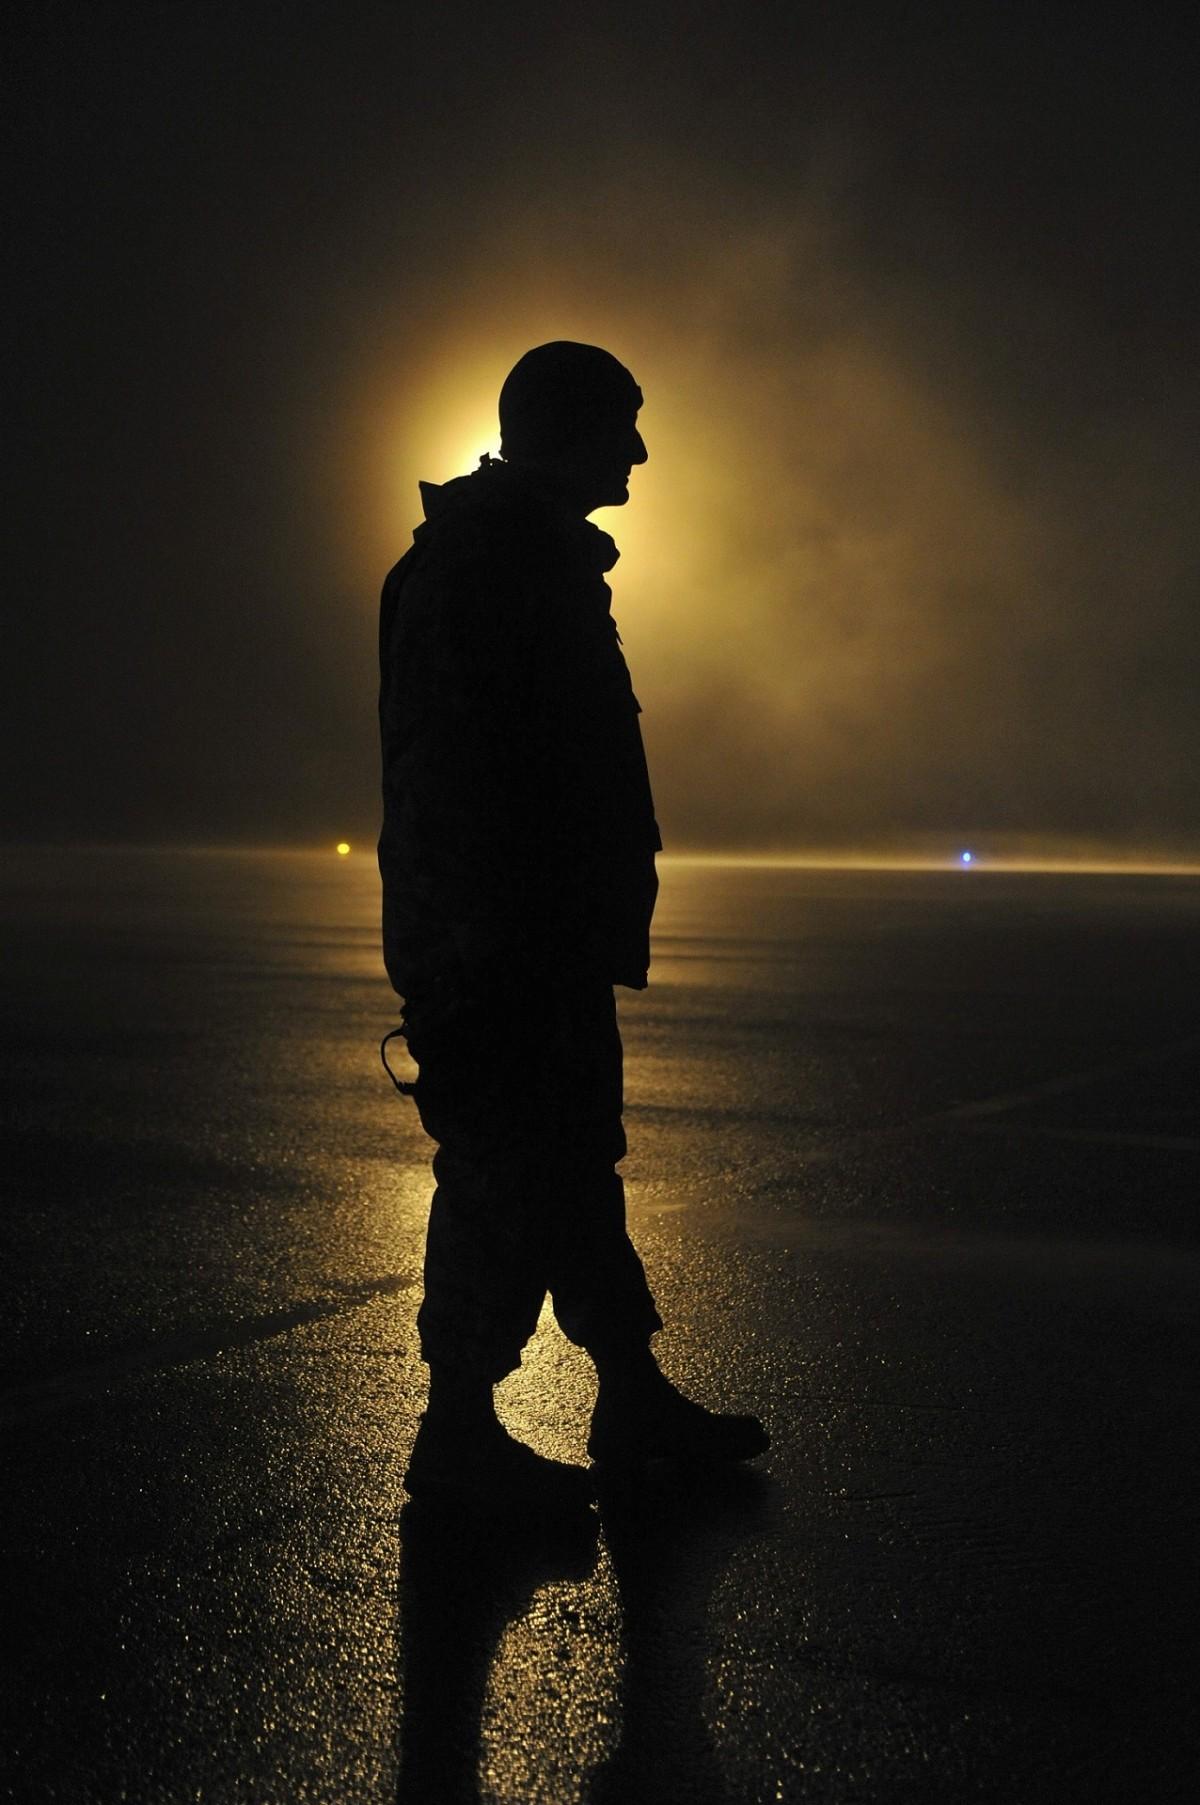 Картинка на аву человек тень